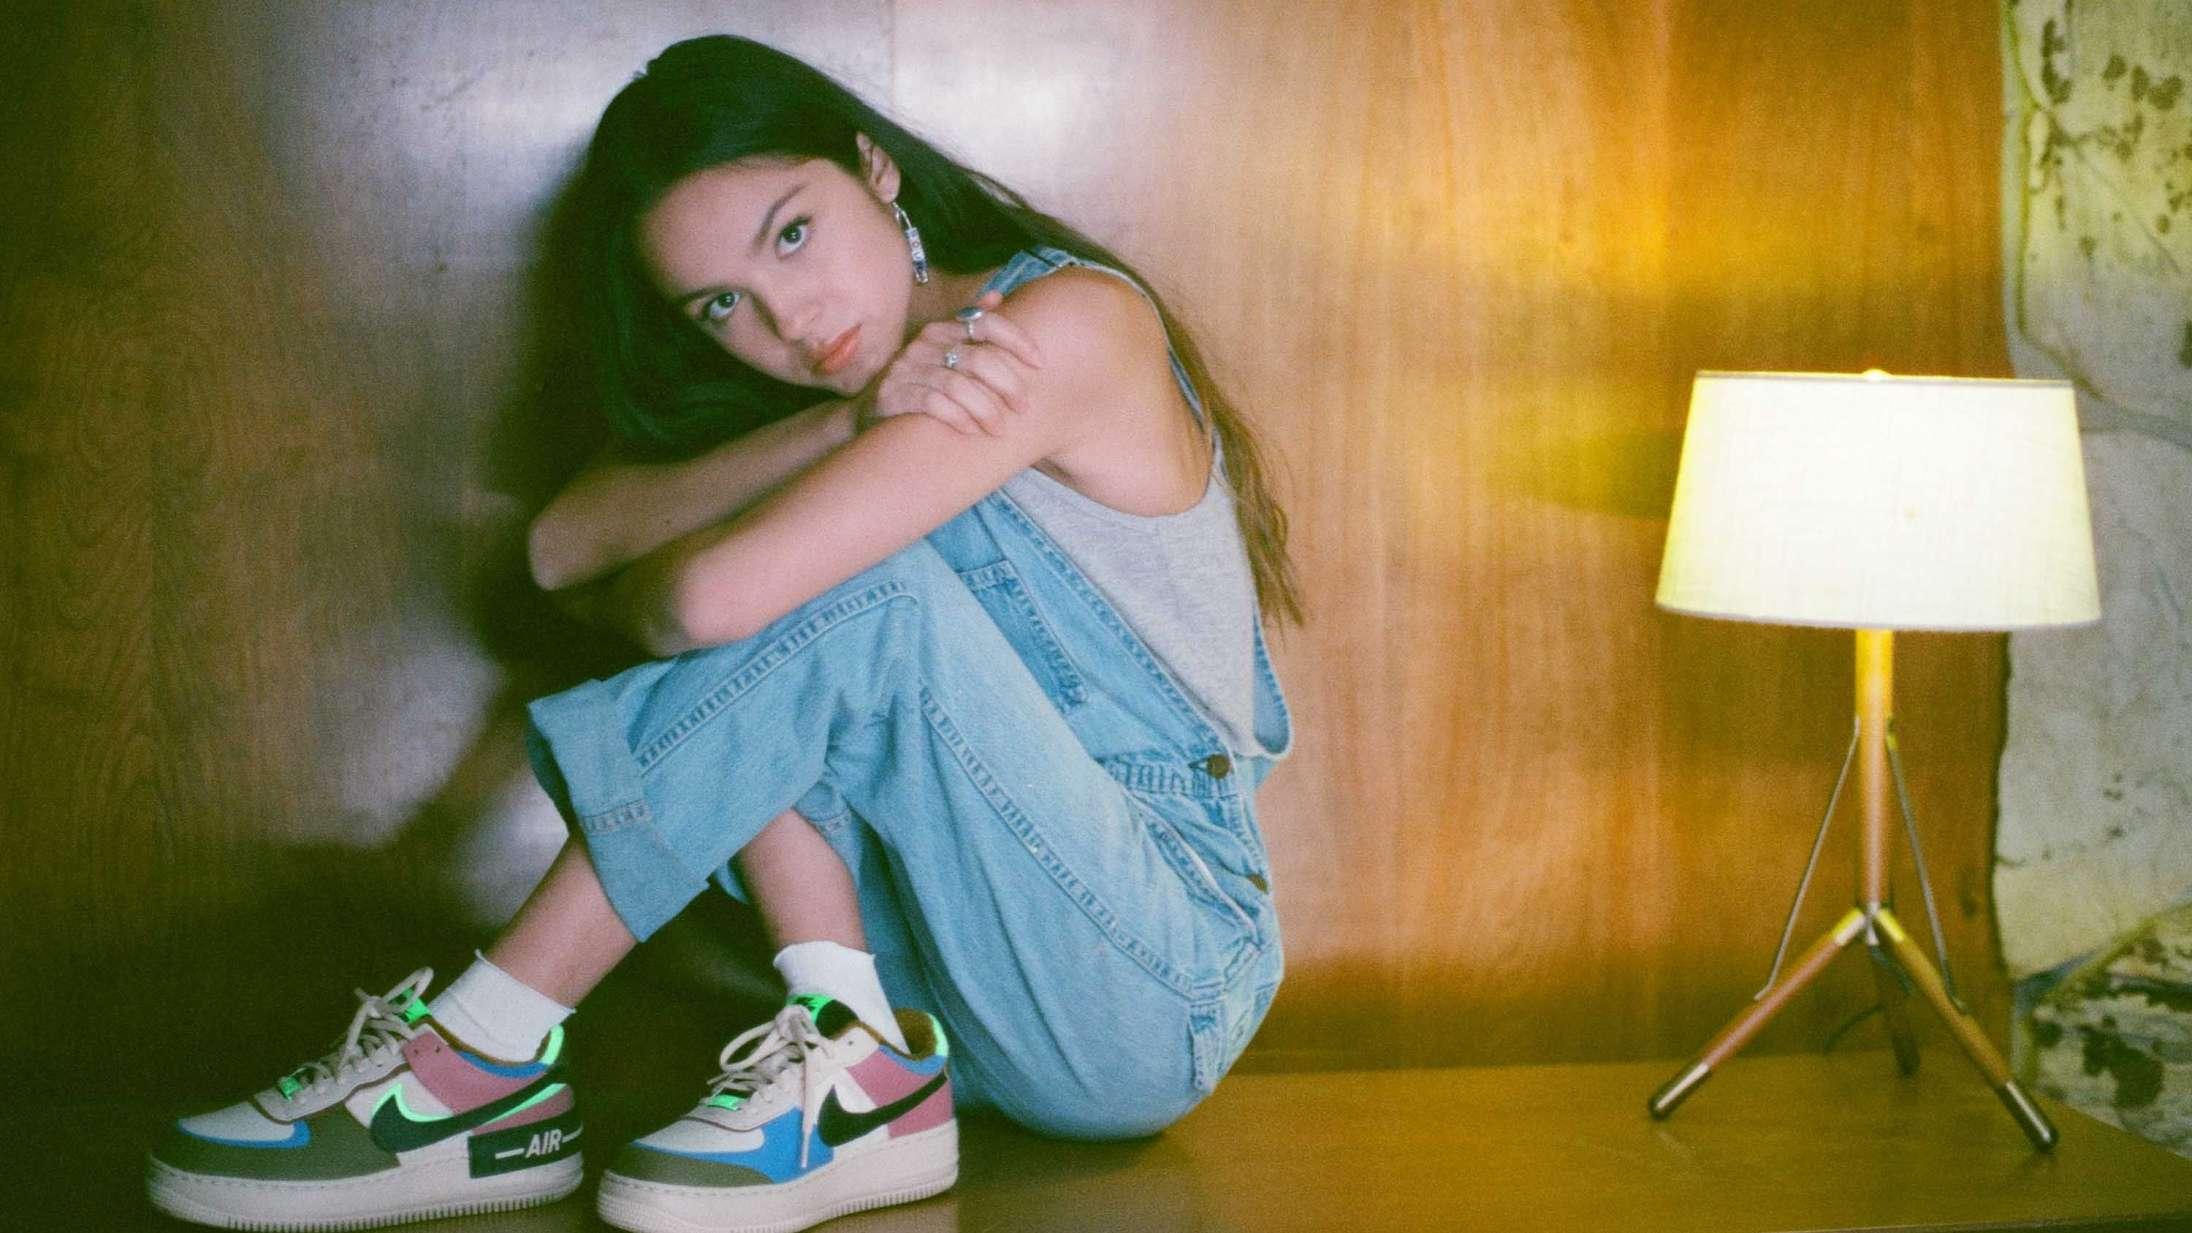 17-årig popkomet er i gang med at slå alle rekorder med debutsingle